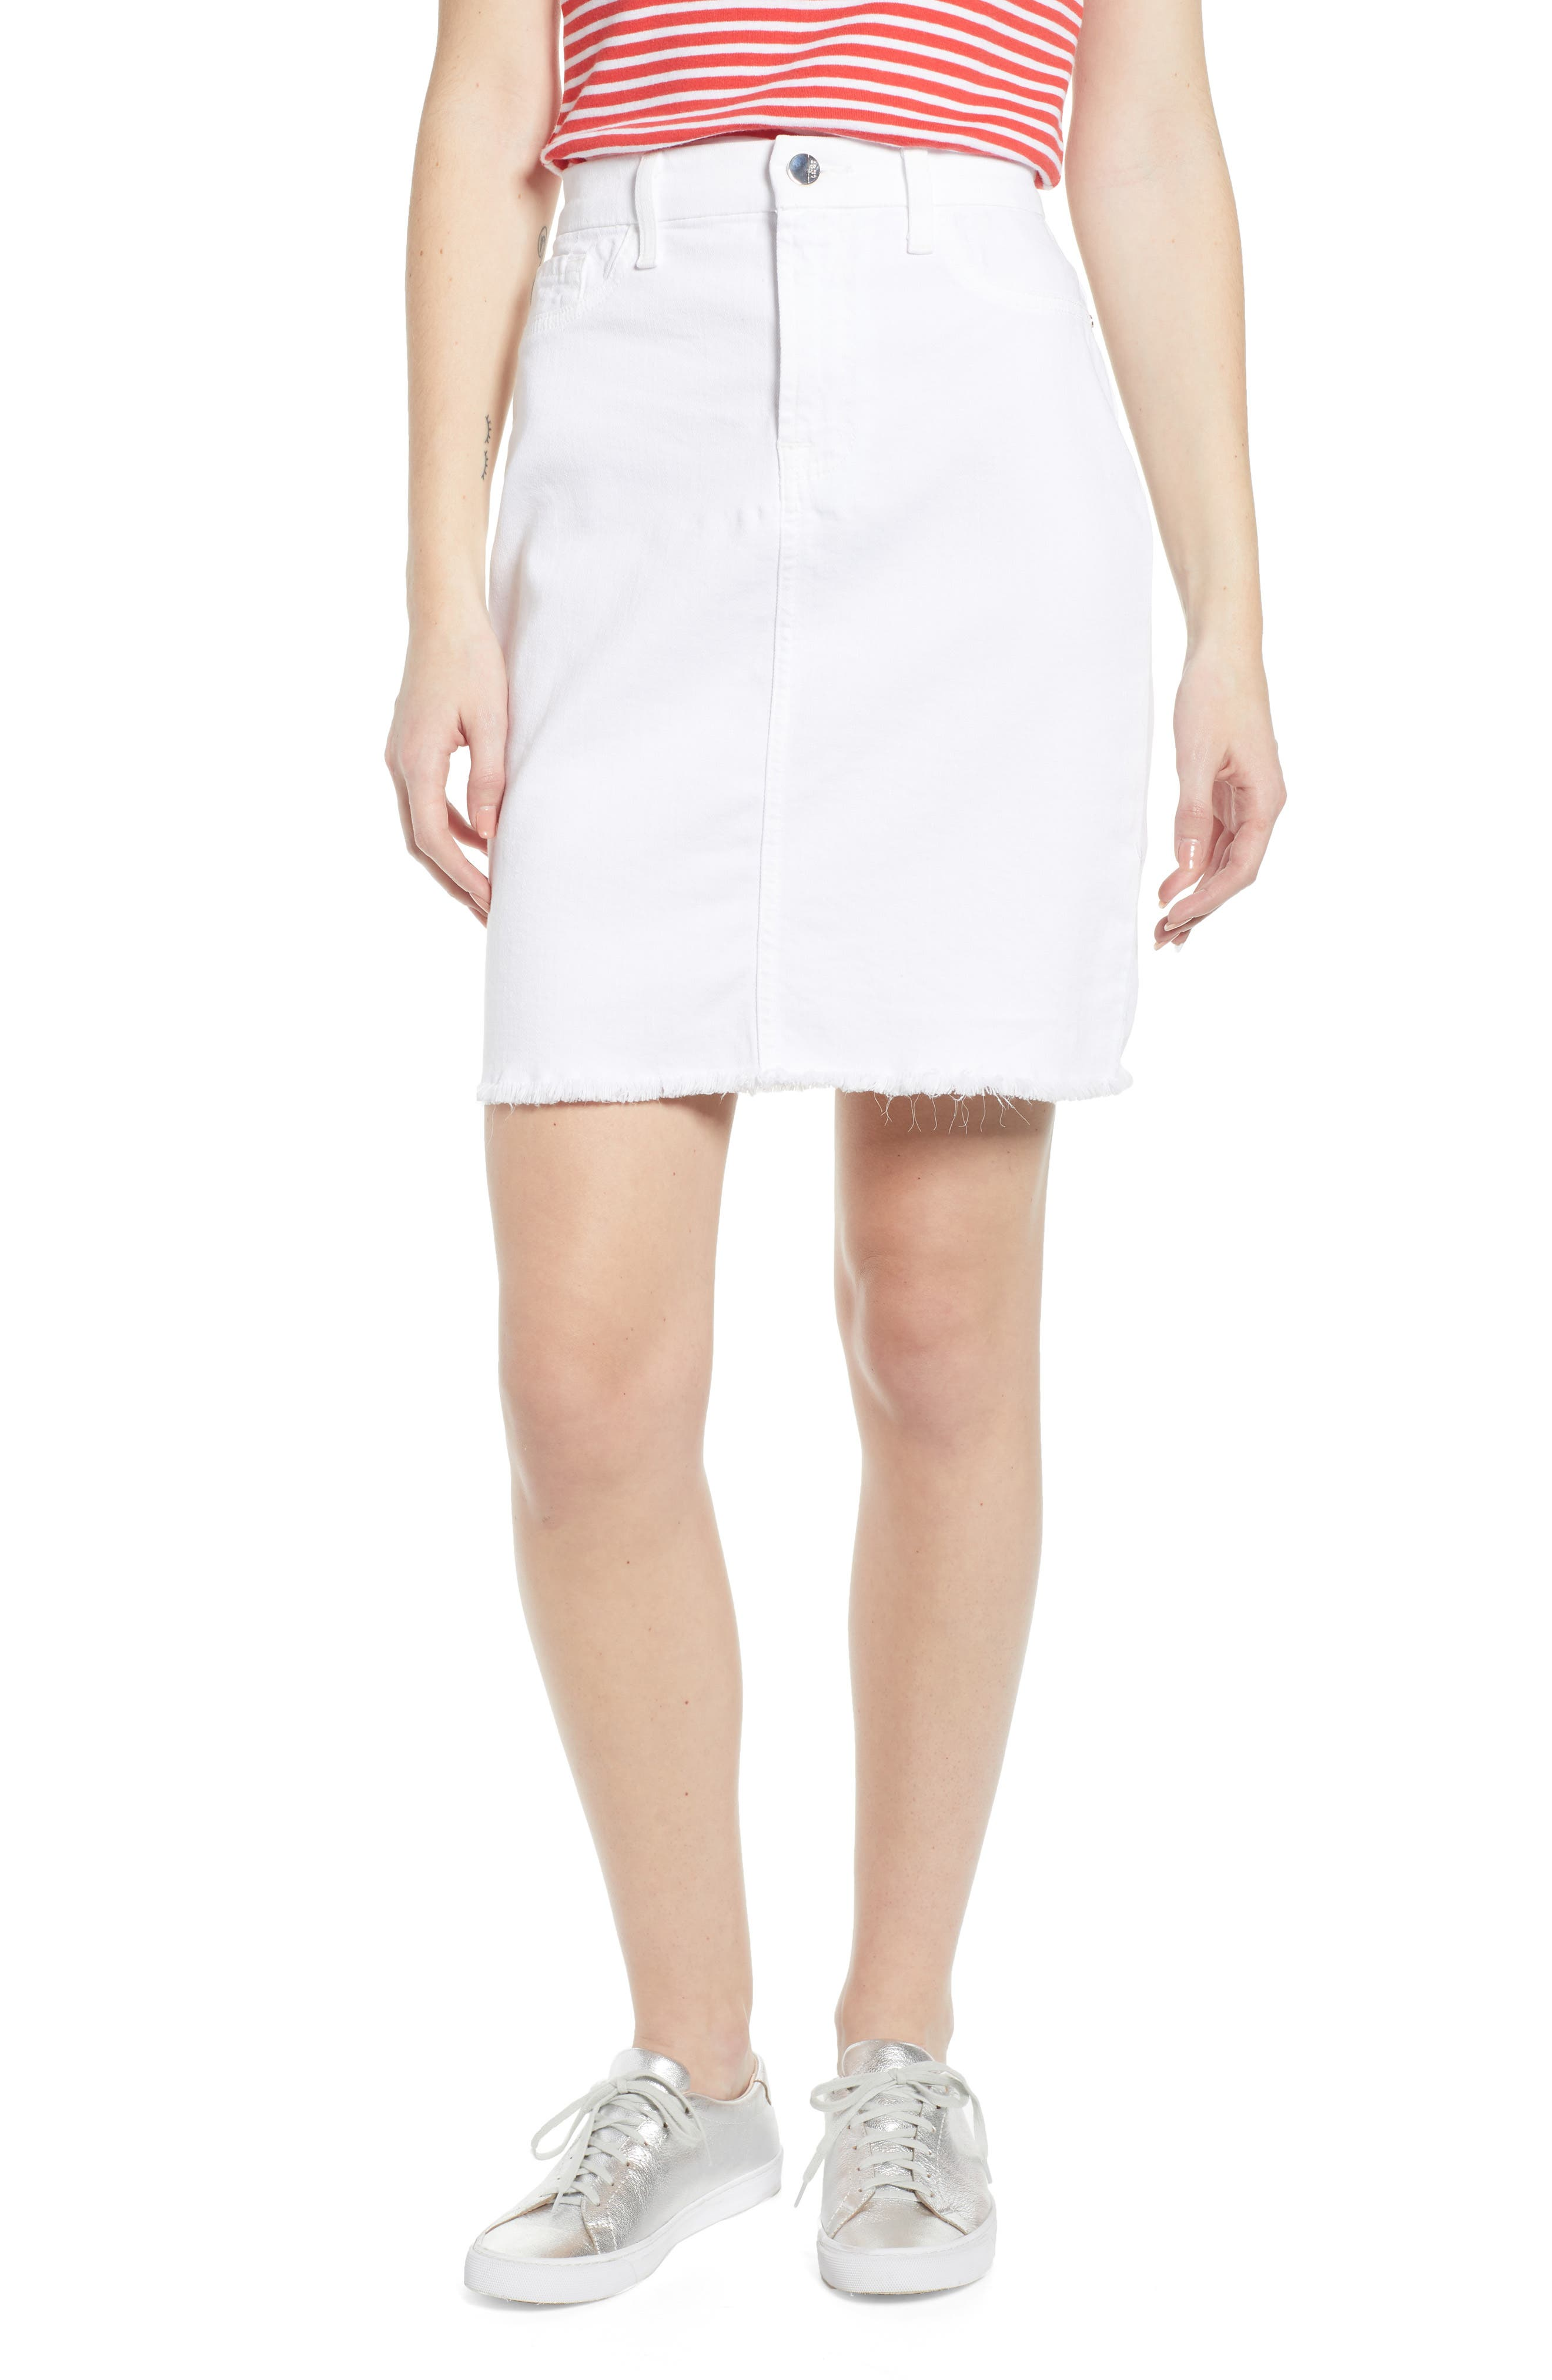 JEN7 BY 7 FOR ALL MANKIND Frayed Hem Denim Pencil Skirt, Main, color, WHITE